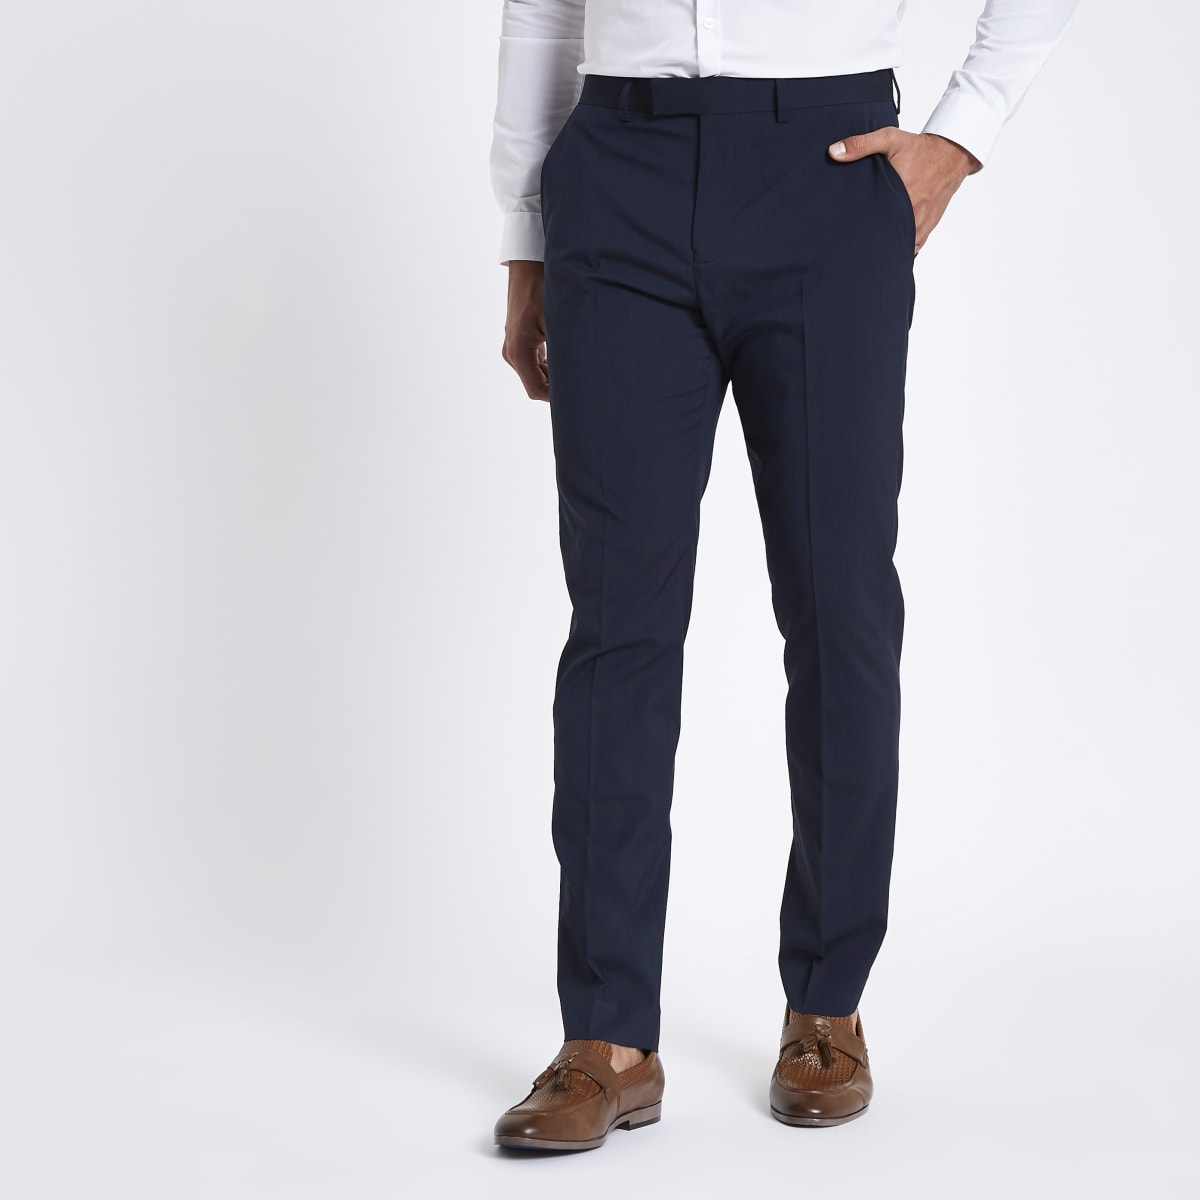 Pantalon de costume coupe slim stretch bleu foncé